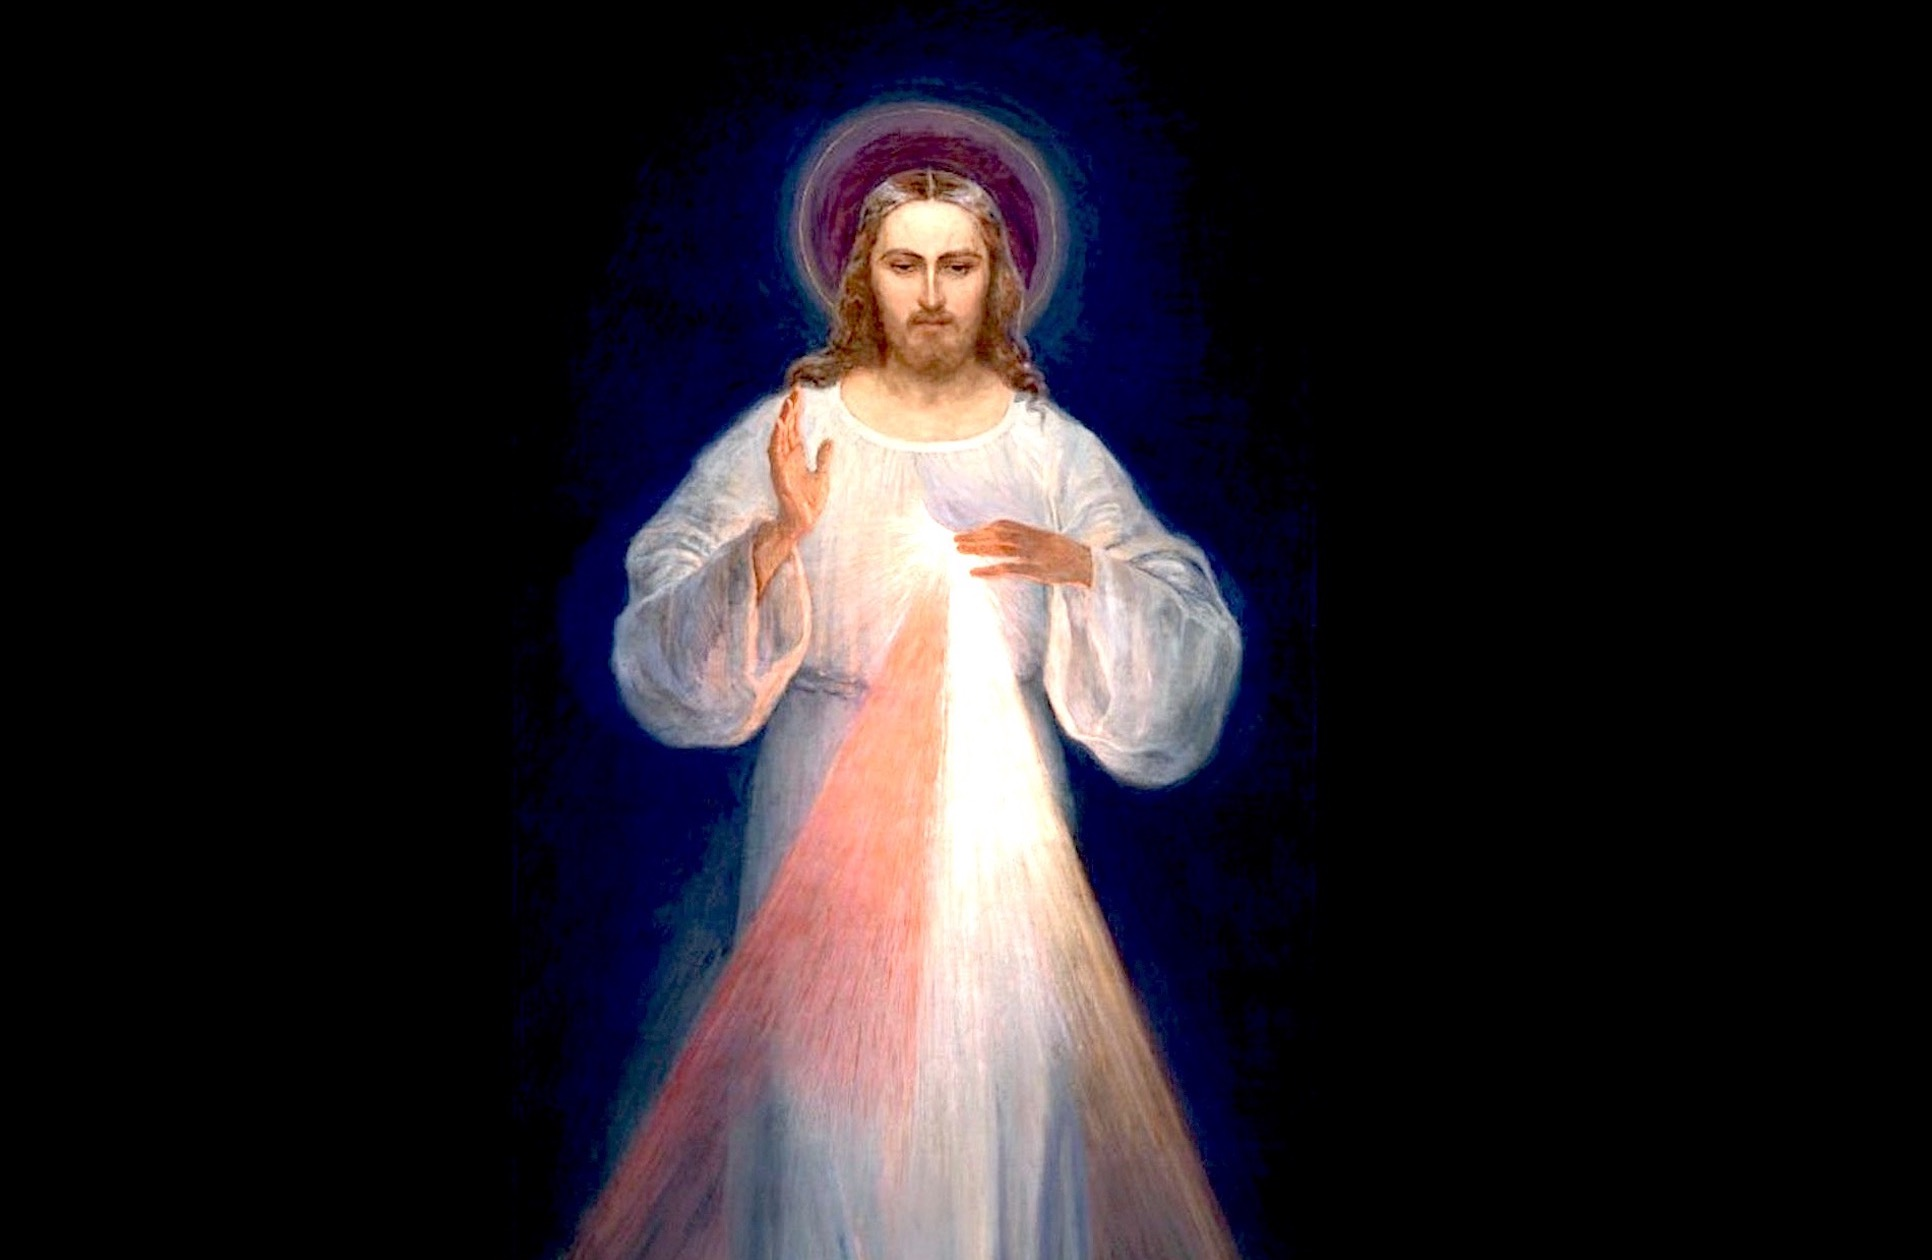 Jesus misericordioso @ gailestingumas.com